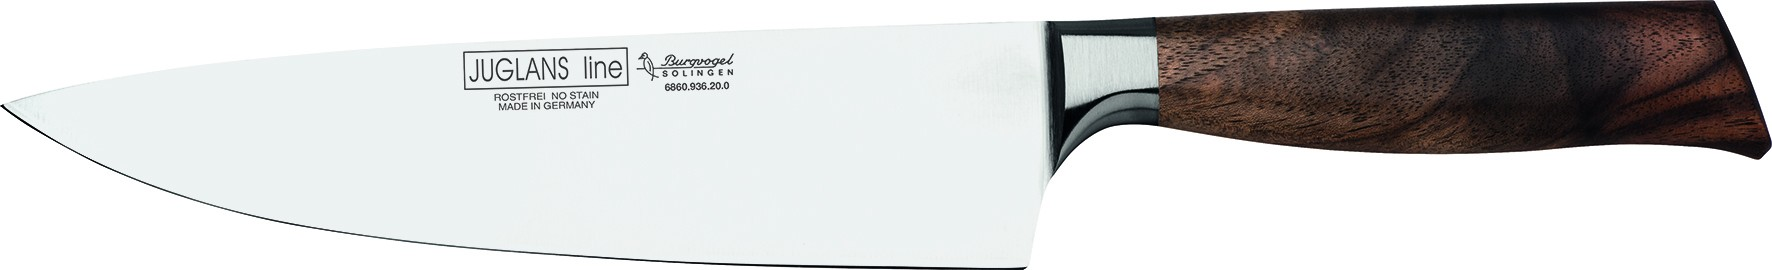 burgvogel-juglans-line-knife